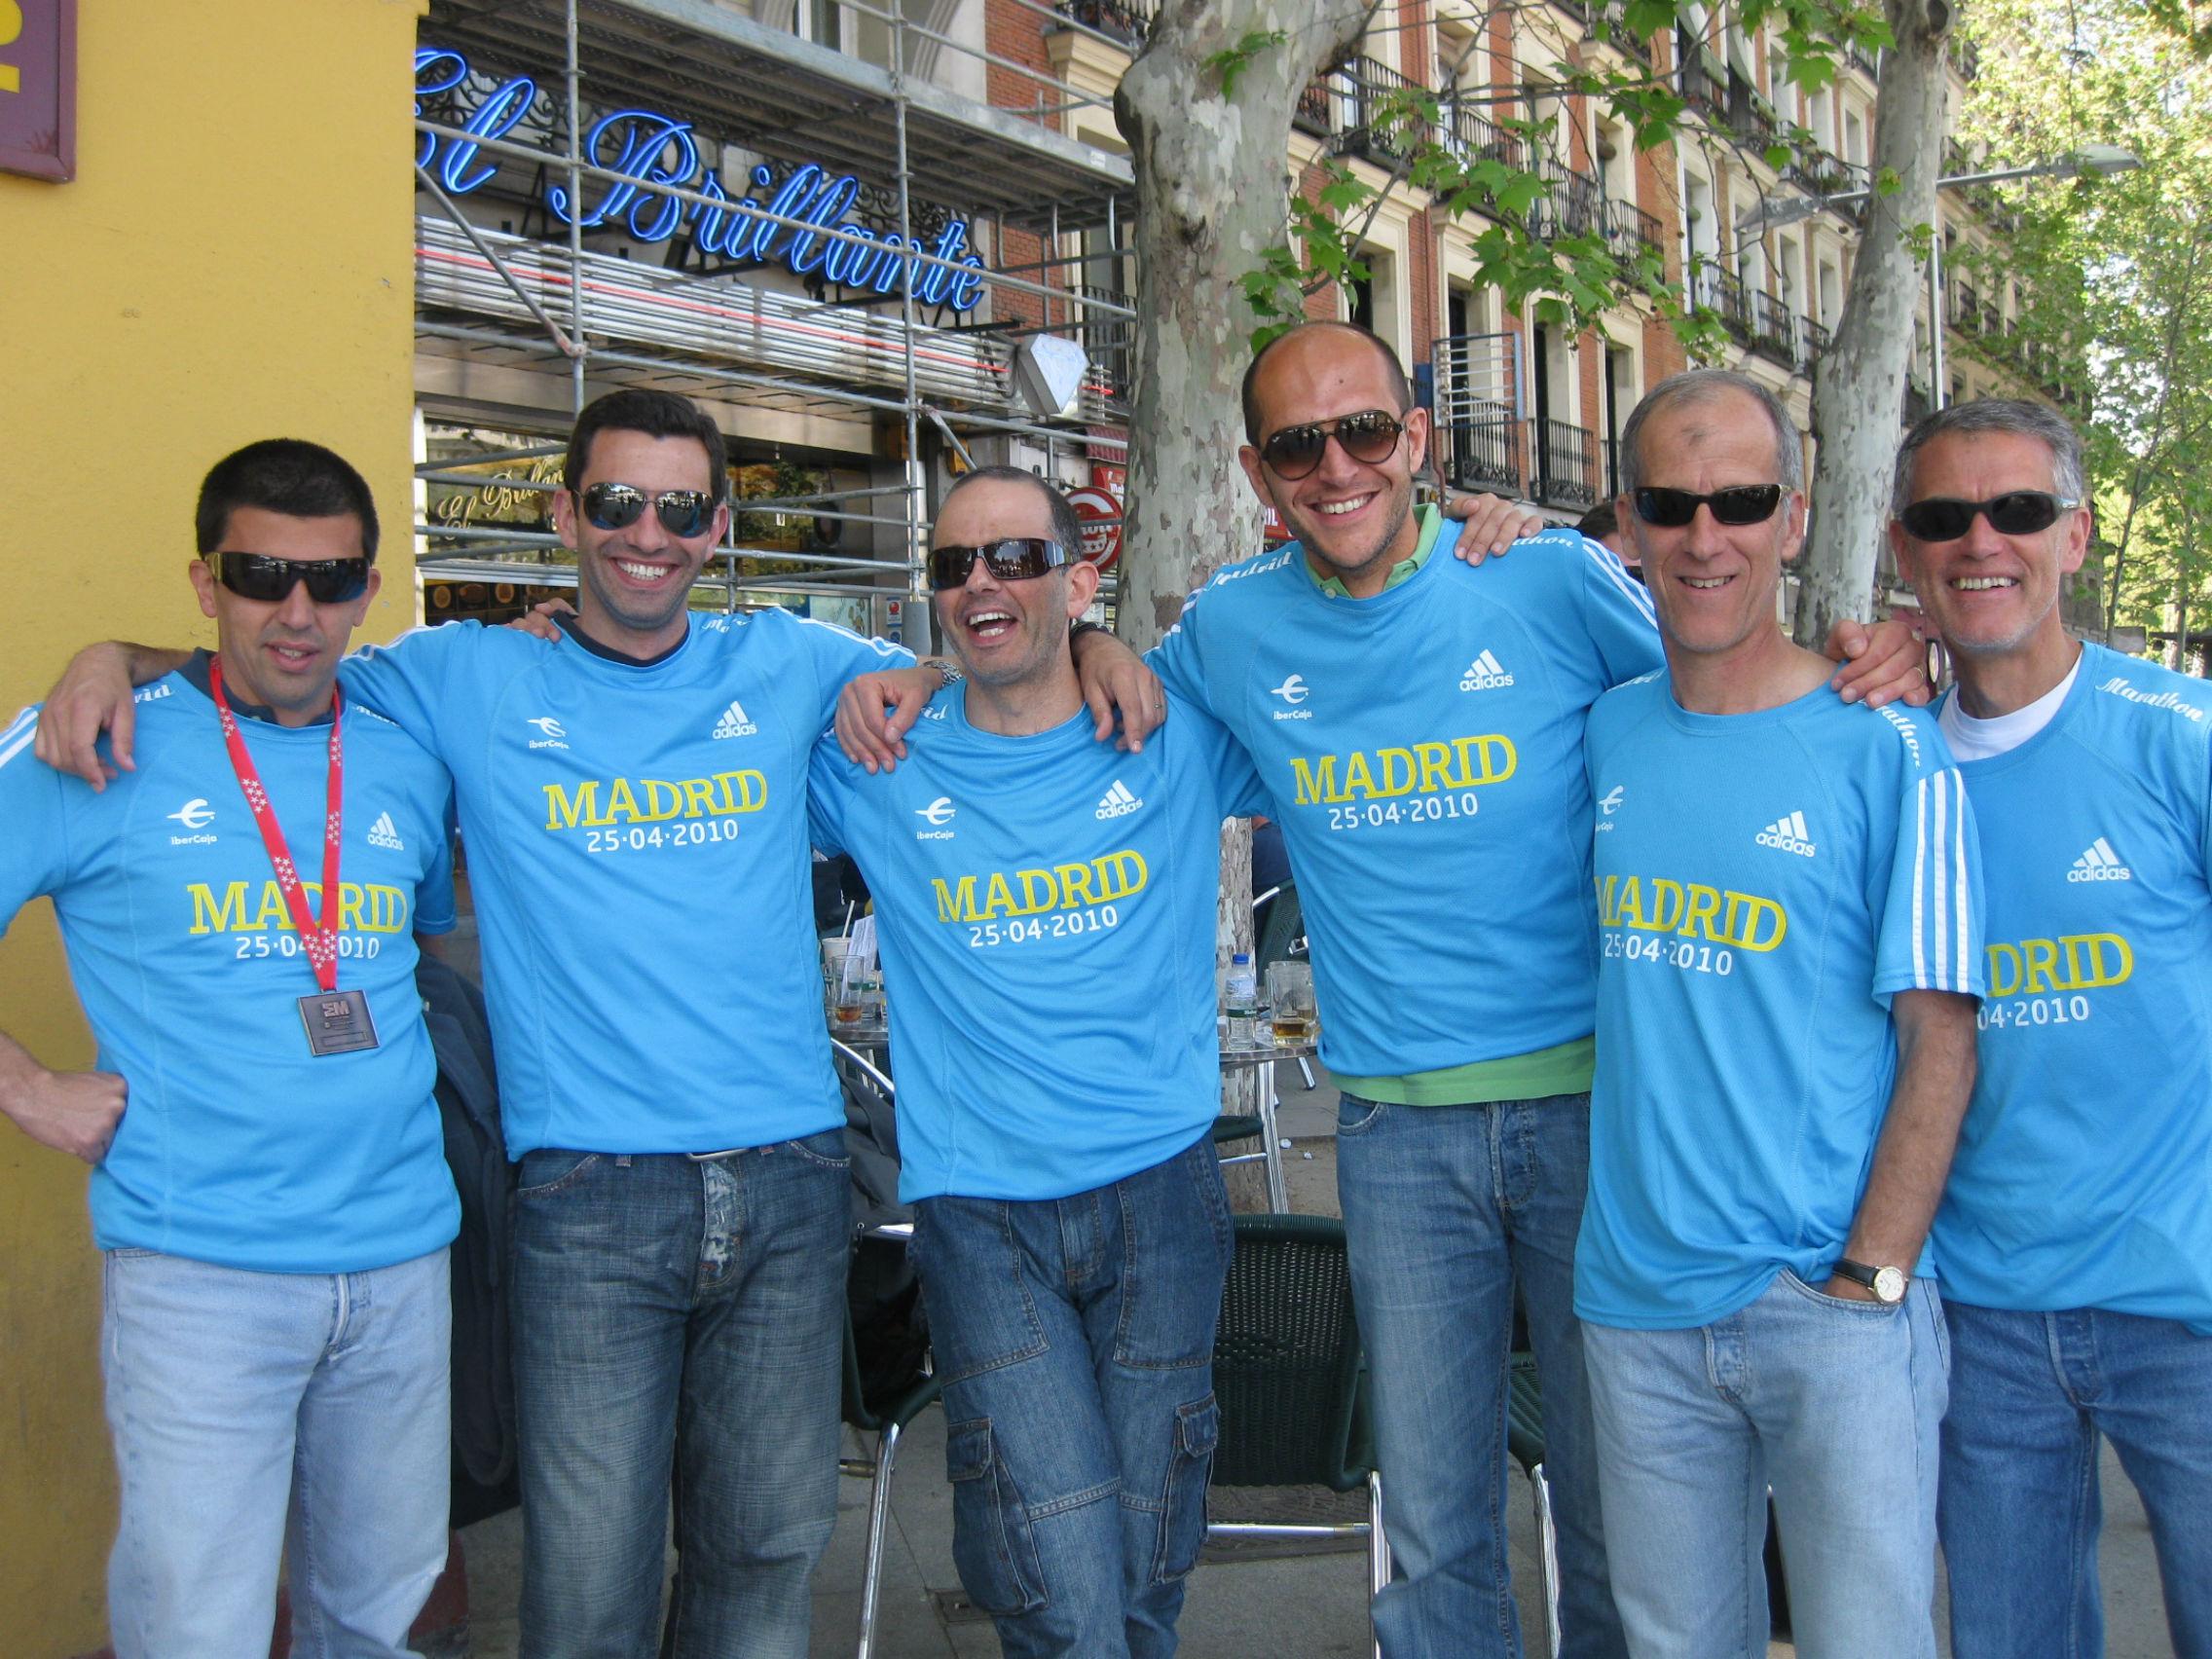 Pires - Madrid 2010